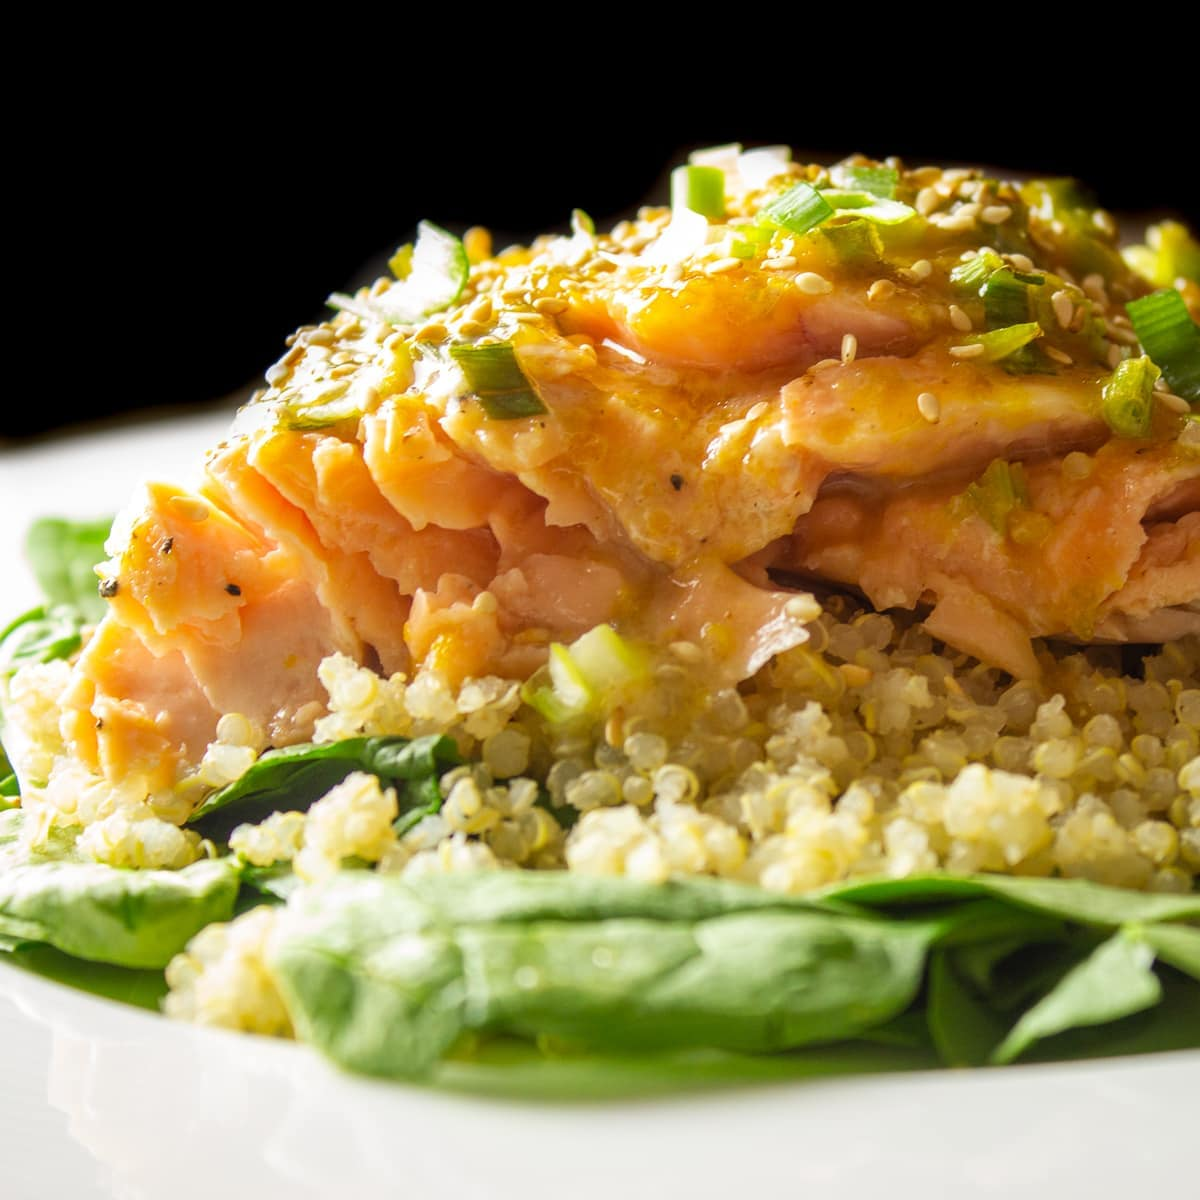 piece of glazed salmon on quinoa